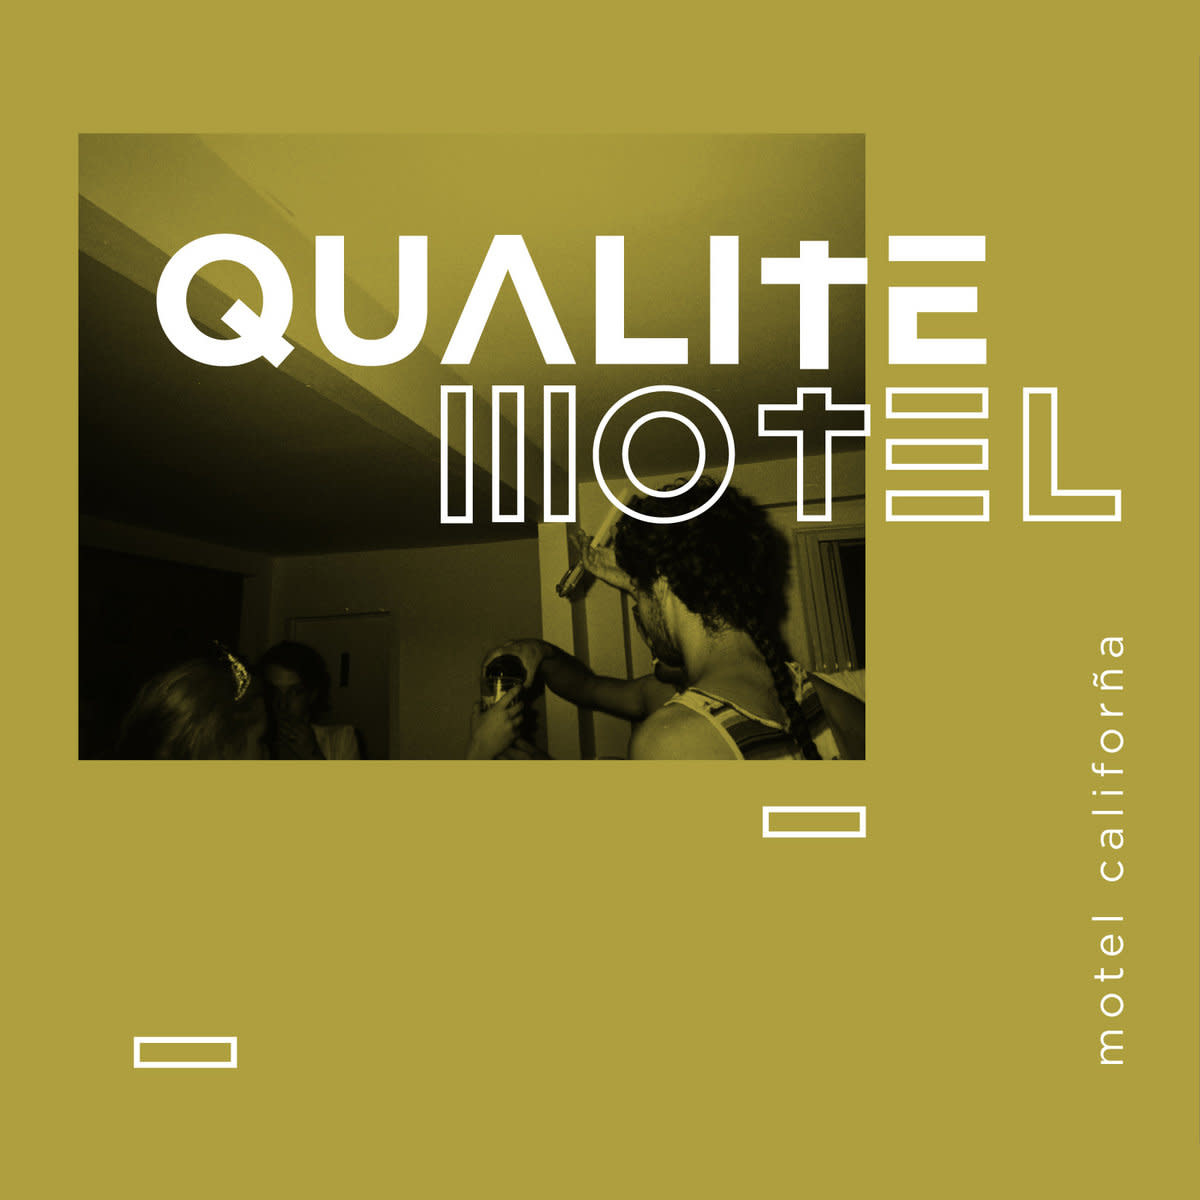 Qualité Motel • Motel Califorña-1